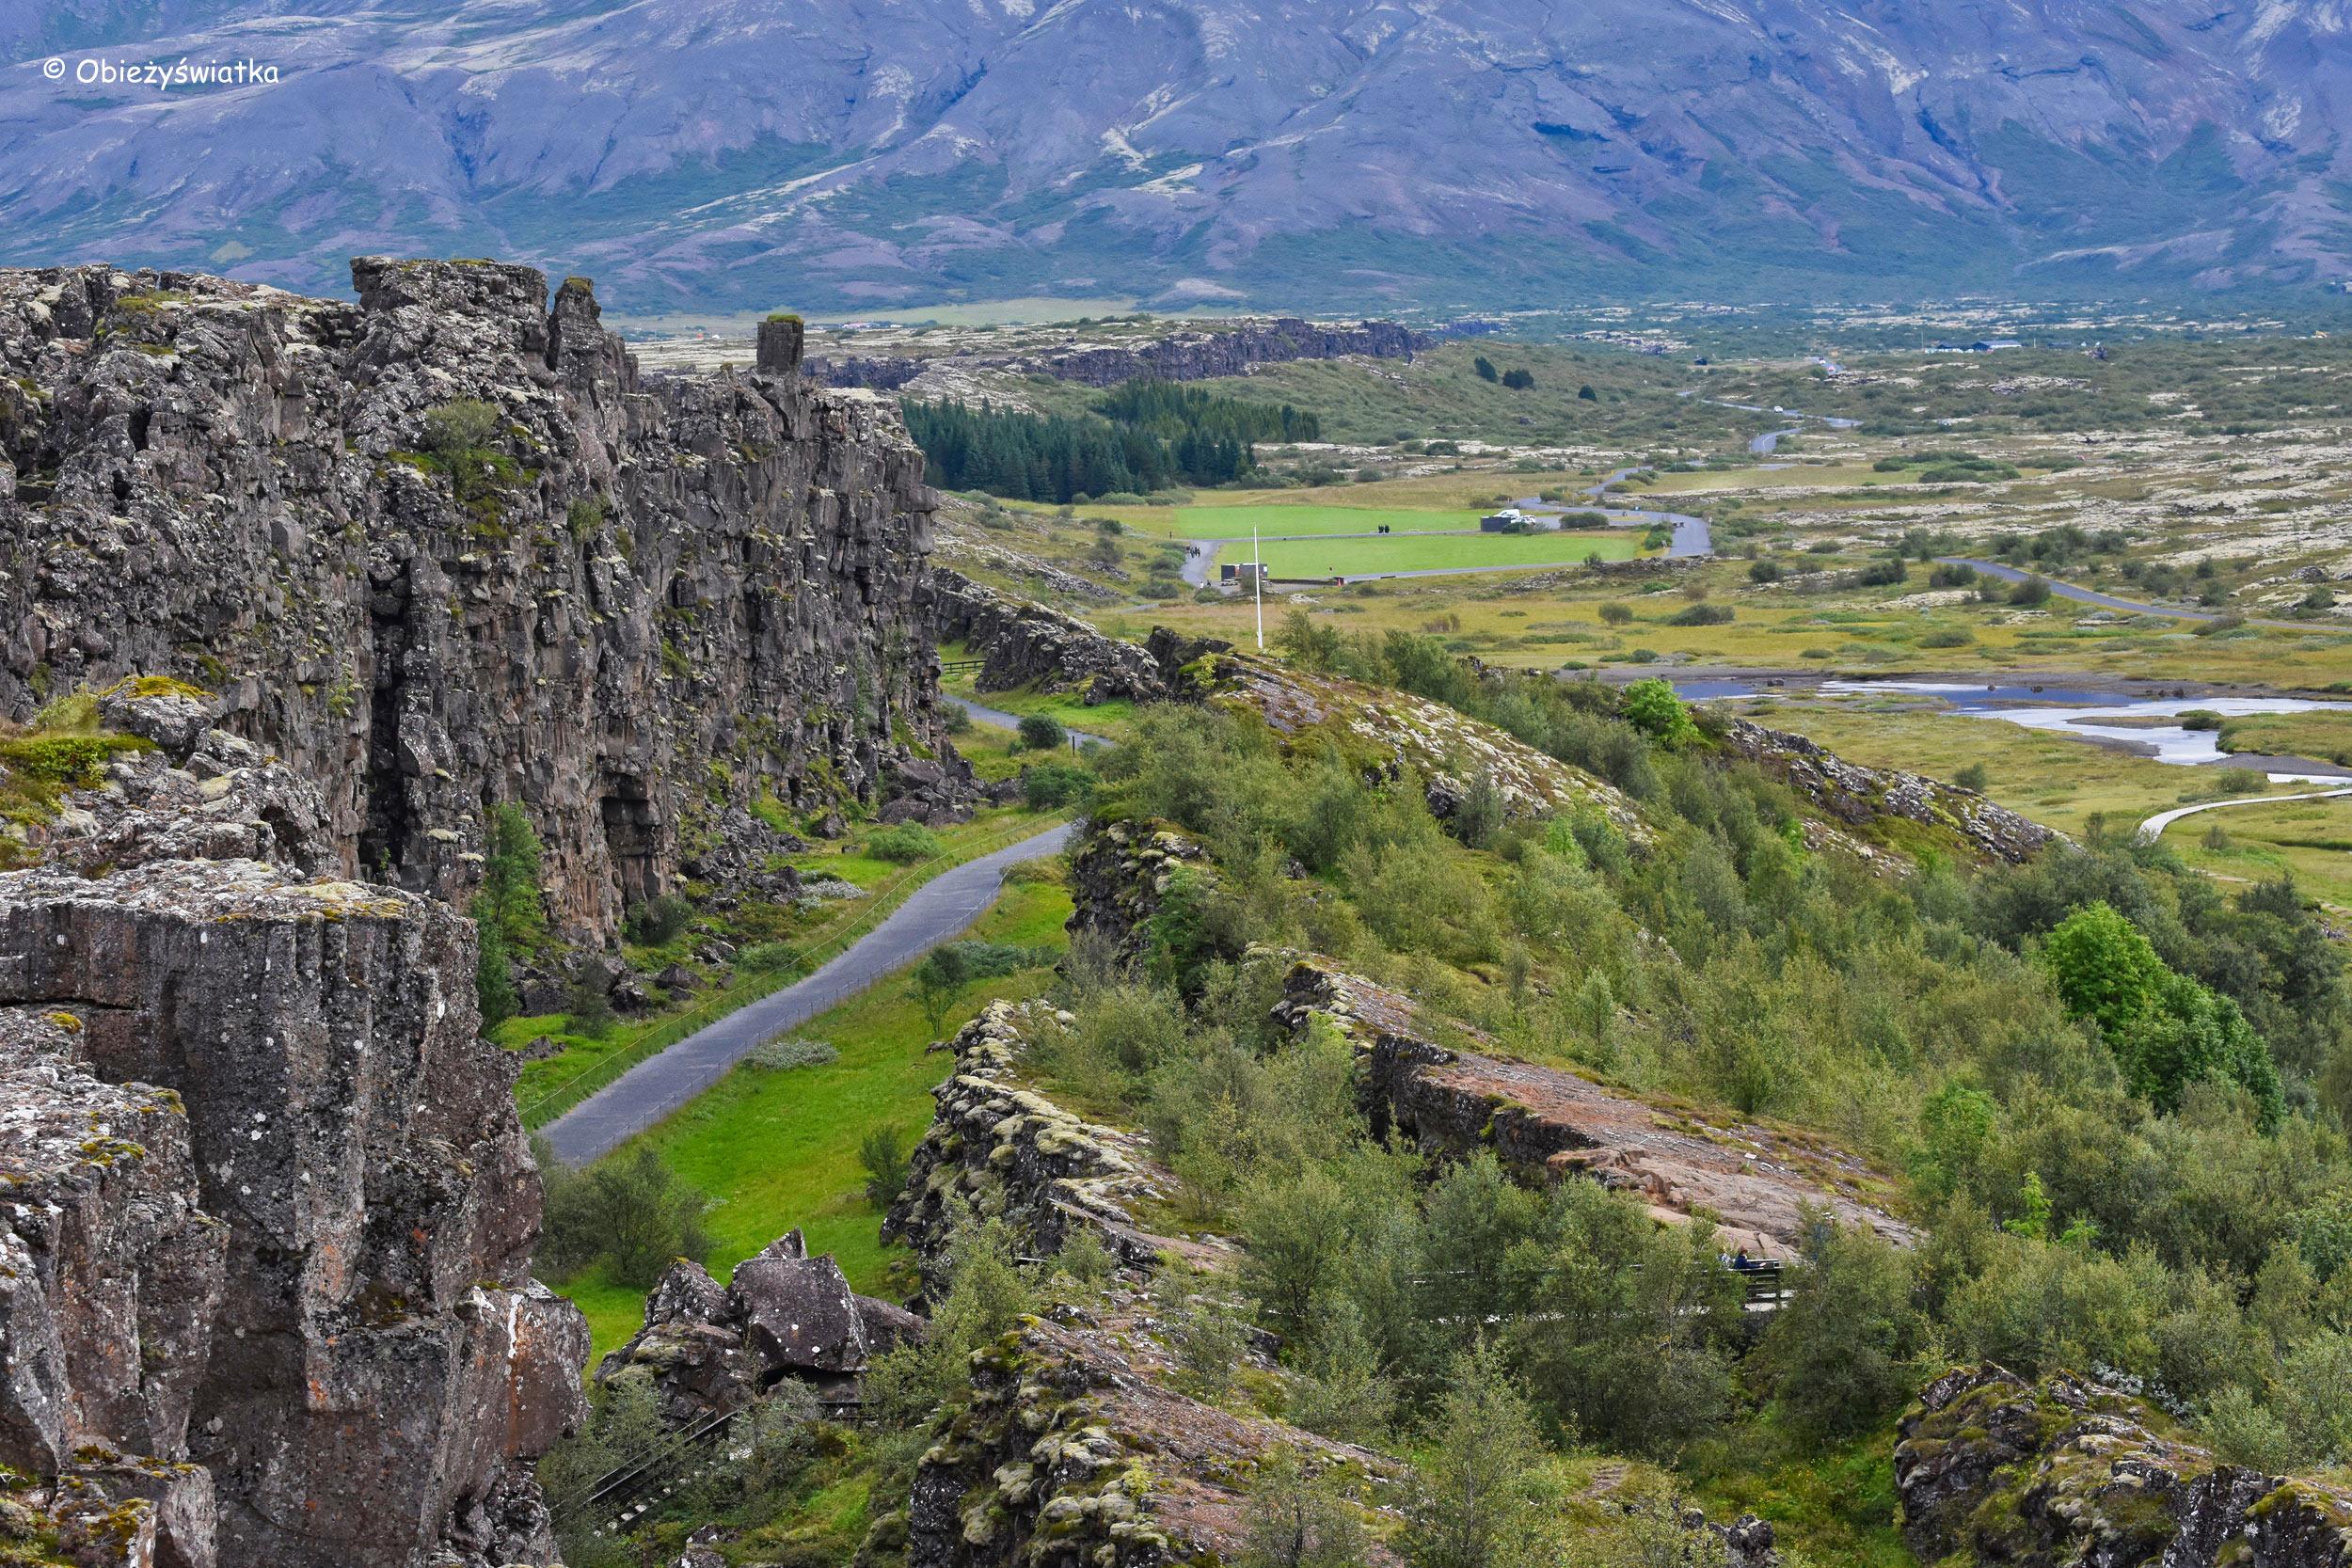 Jeden ze szlaków w Þingvellir, Islandia